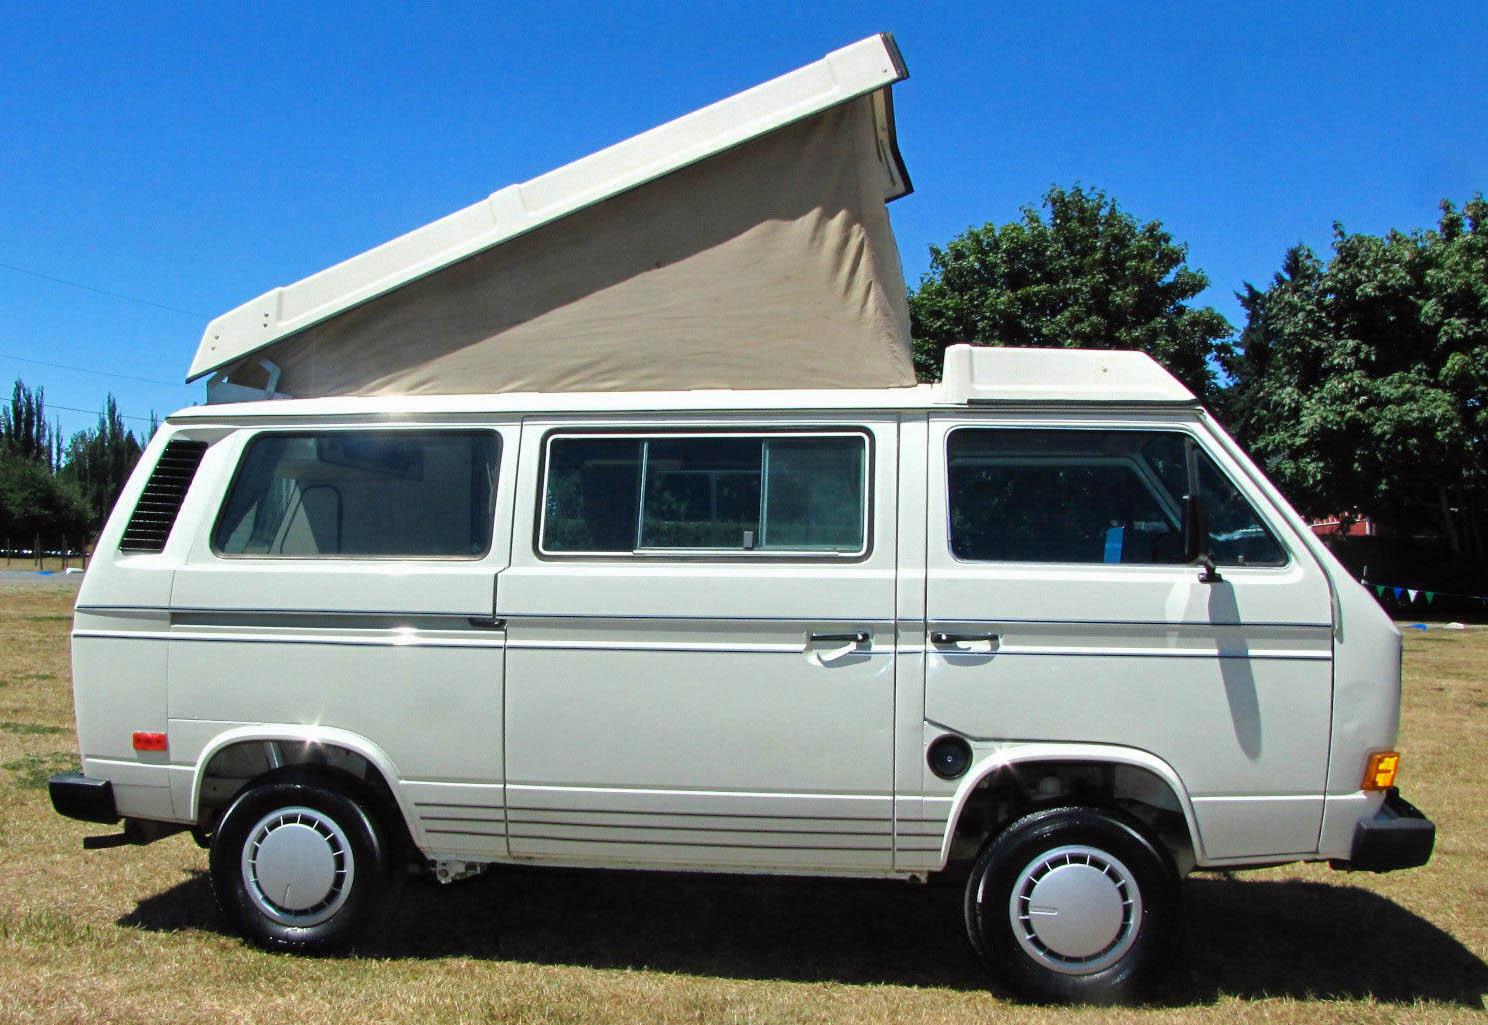 1985 VW Vanagon Westfalia Camper Auction in Lakewood, WA